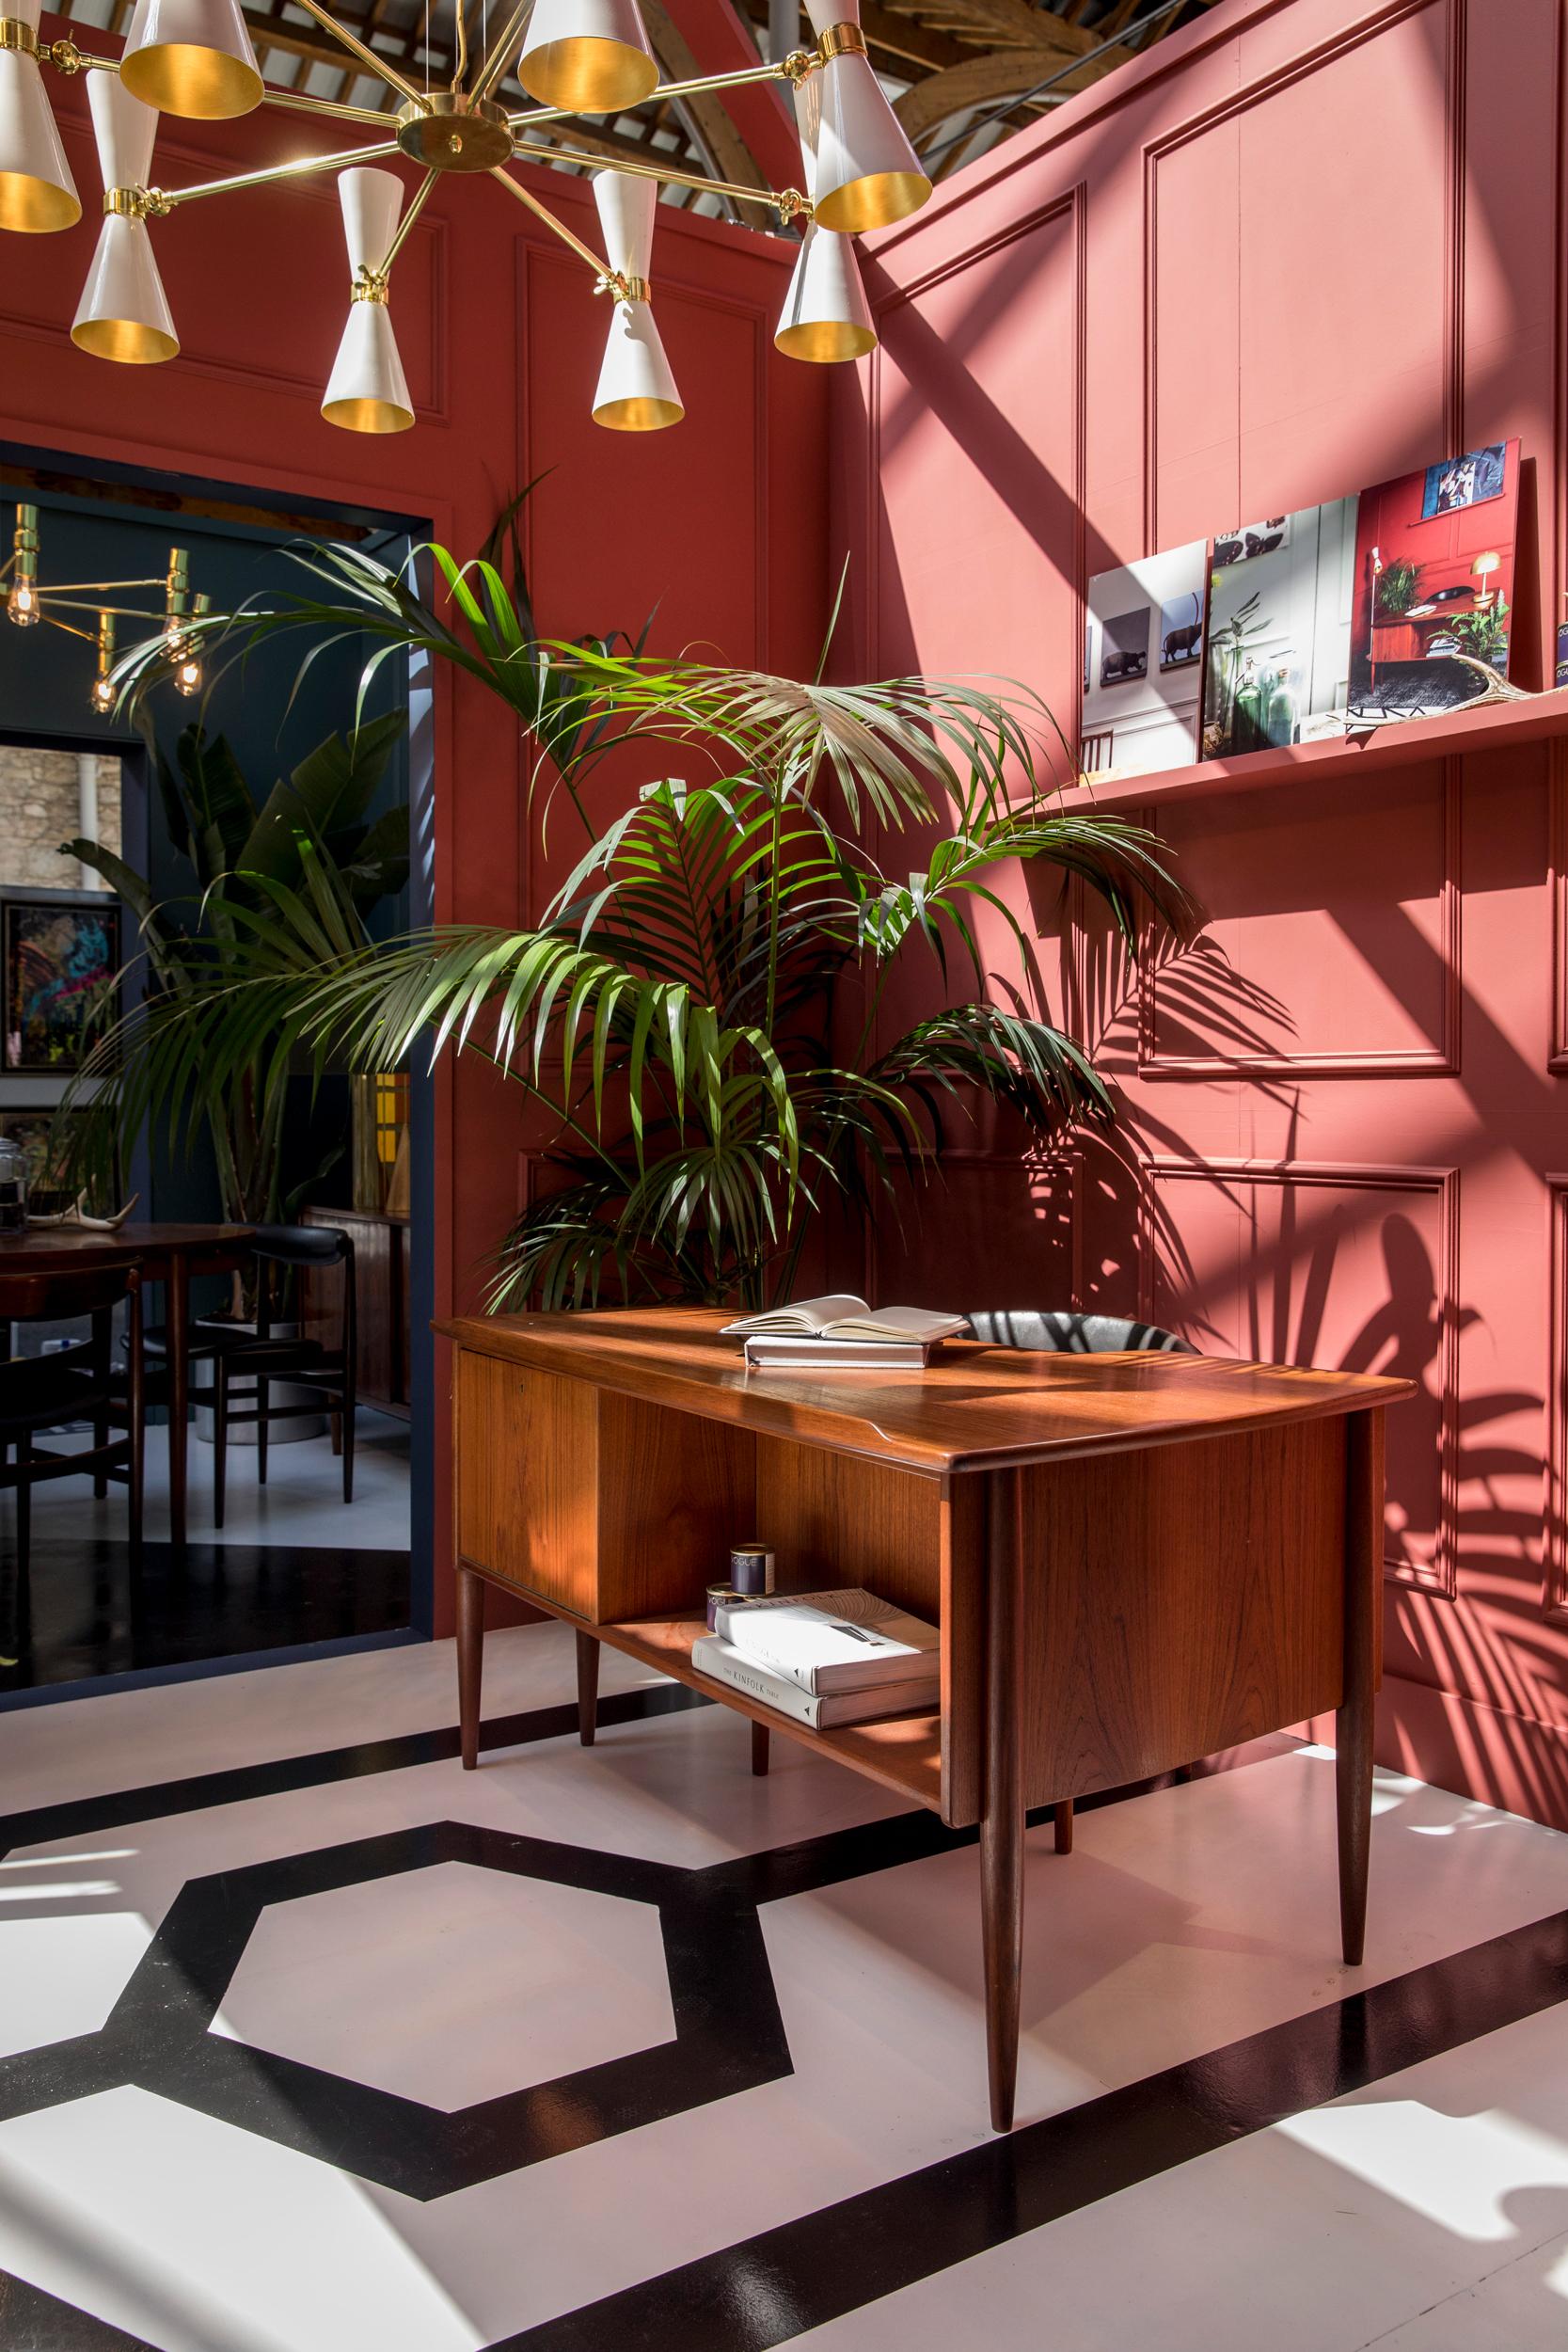 Fleetwood Paints for Kingston Lafferty Interiors